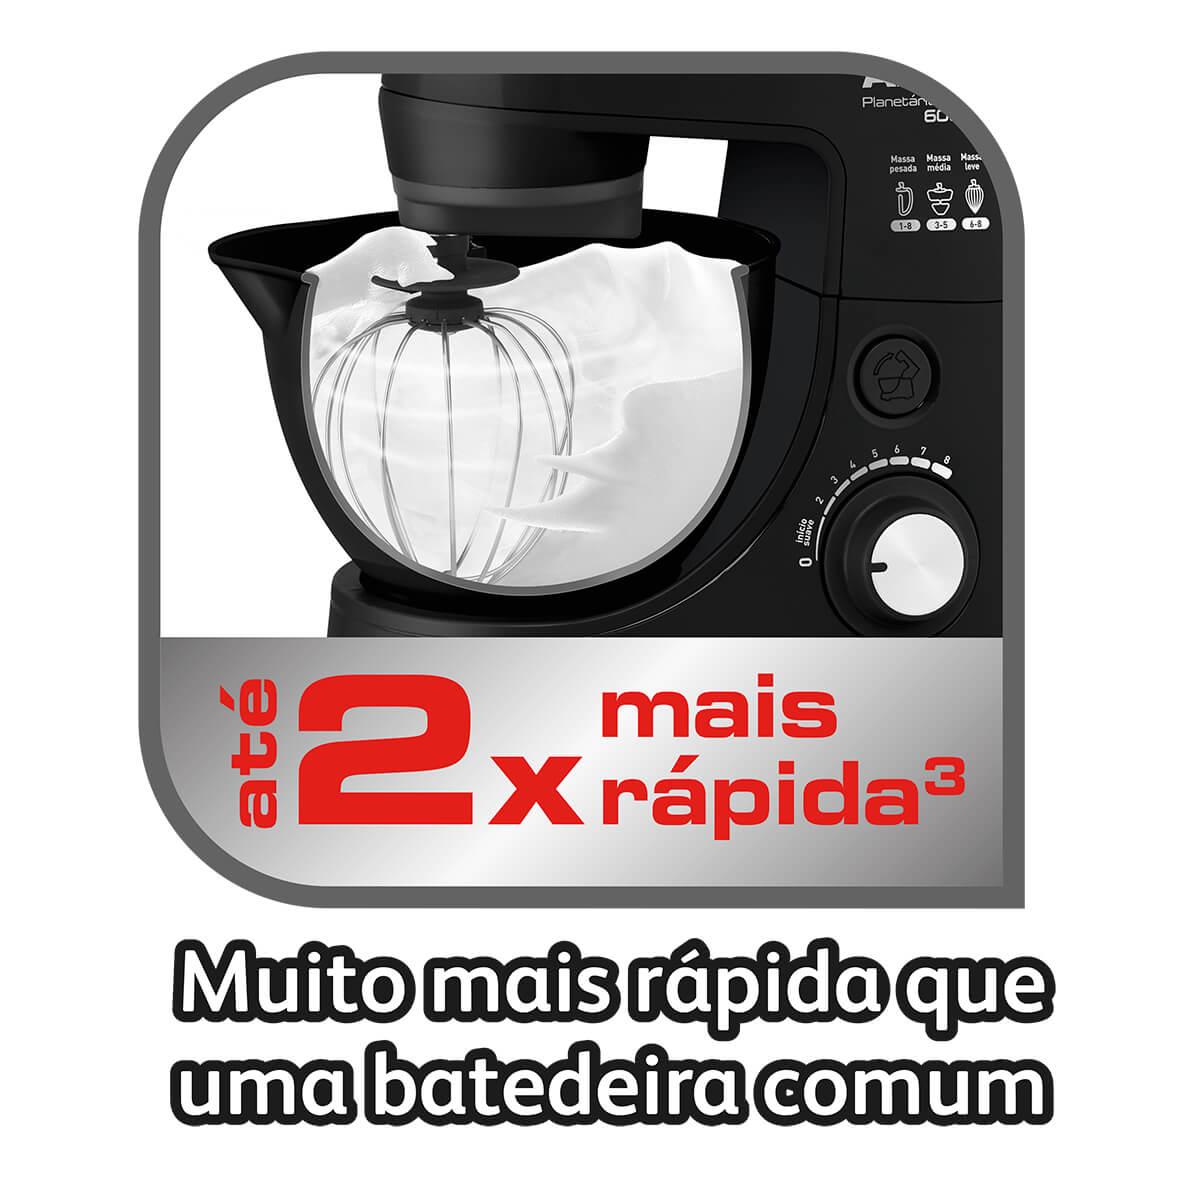 BATEDEIRA PLANETÁRIA ARNO DELUXE 2 TIGELAS - PRETA - SX31